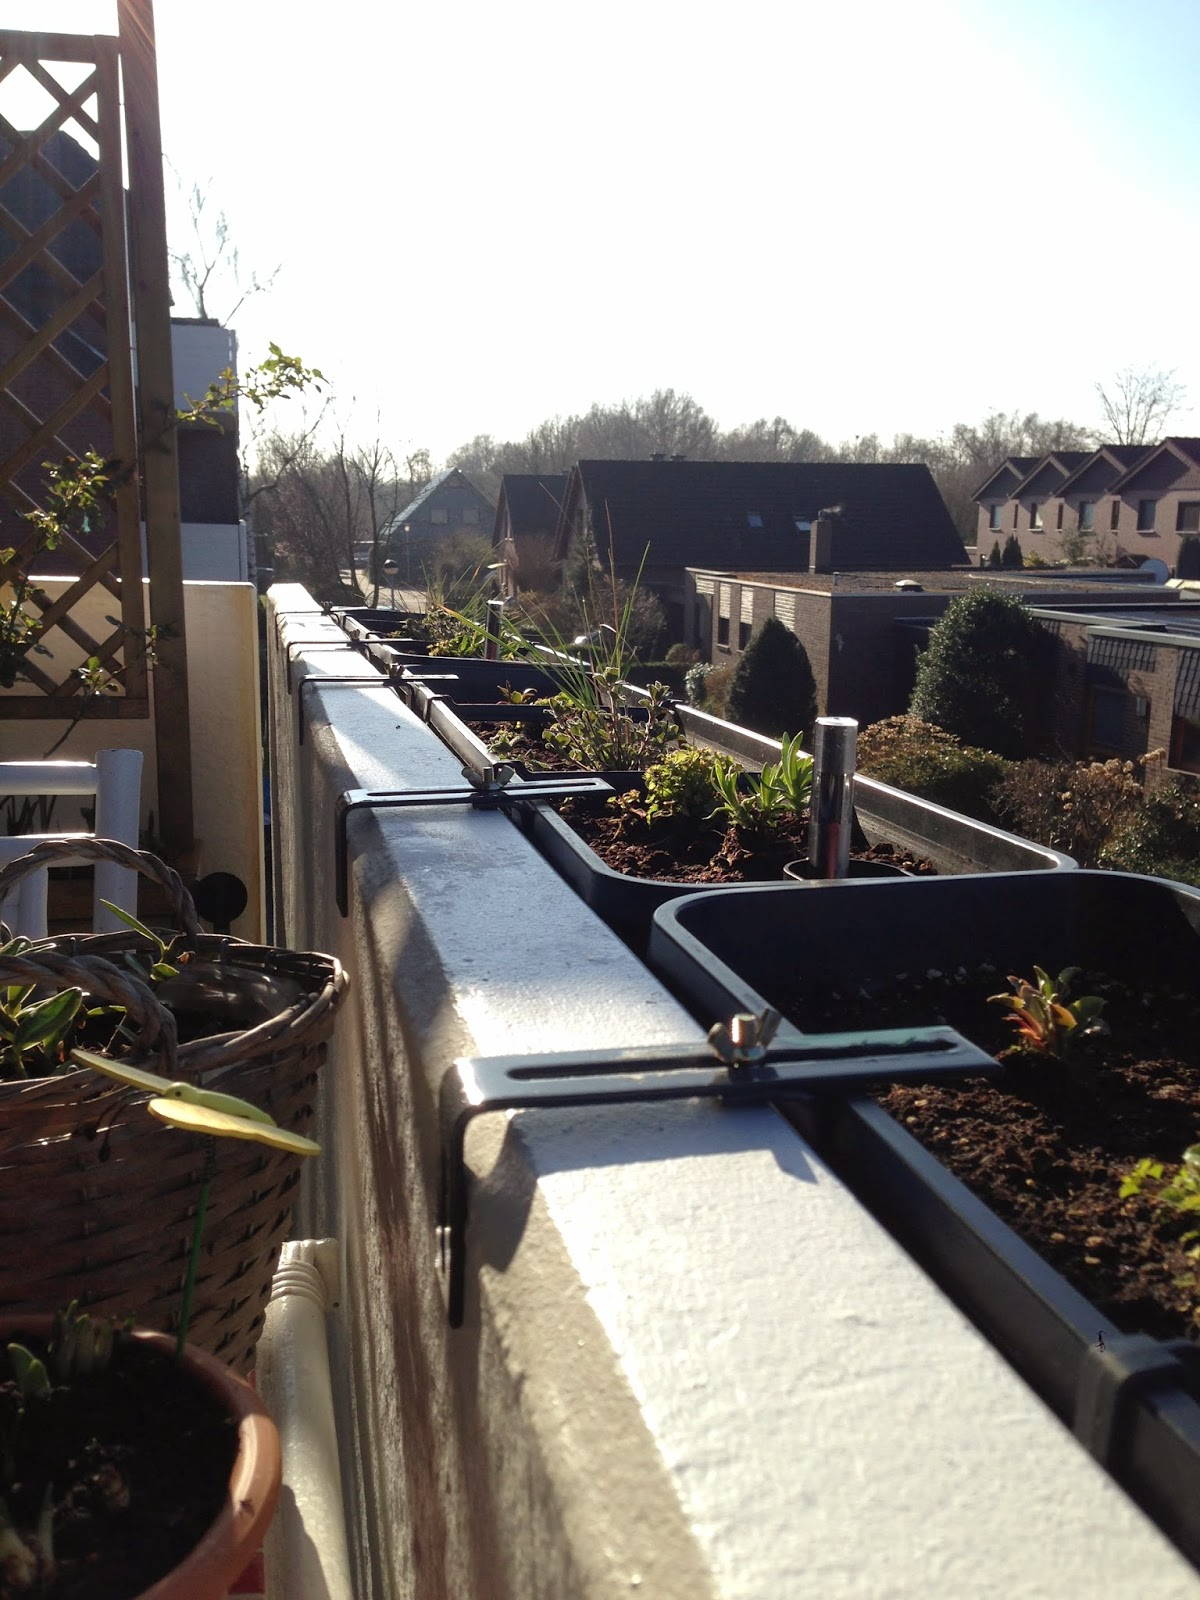 tessimo 39 s balkongeschichten balkonk sten winterhart. Black Bedroom Furniture Sets. Home Design Ideas